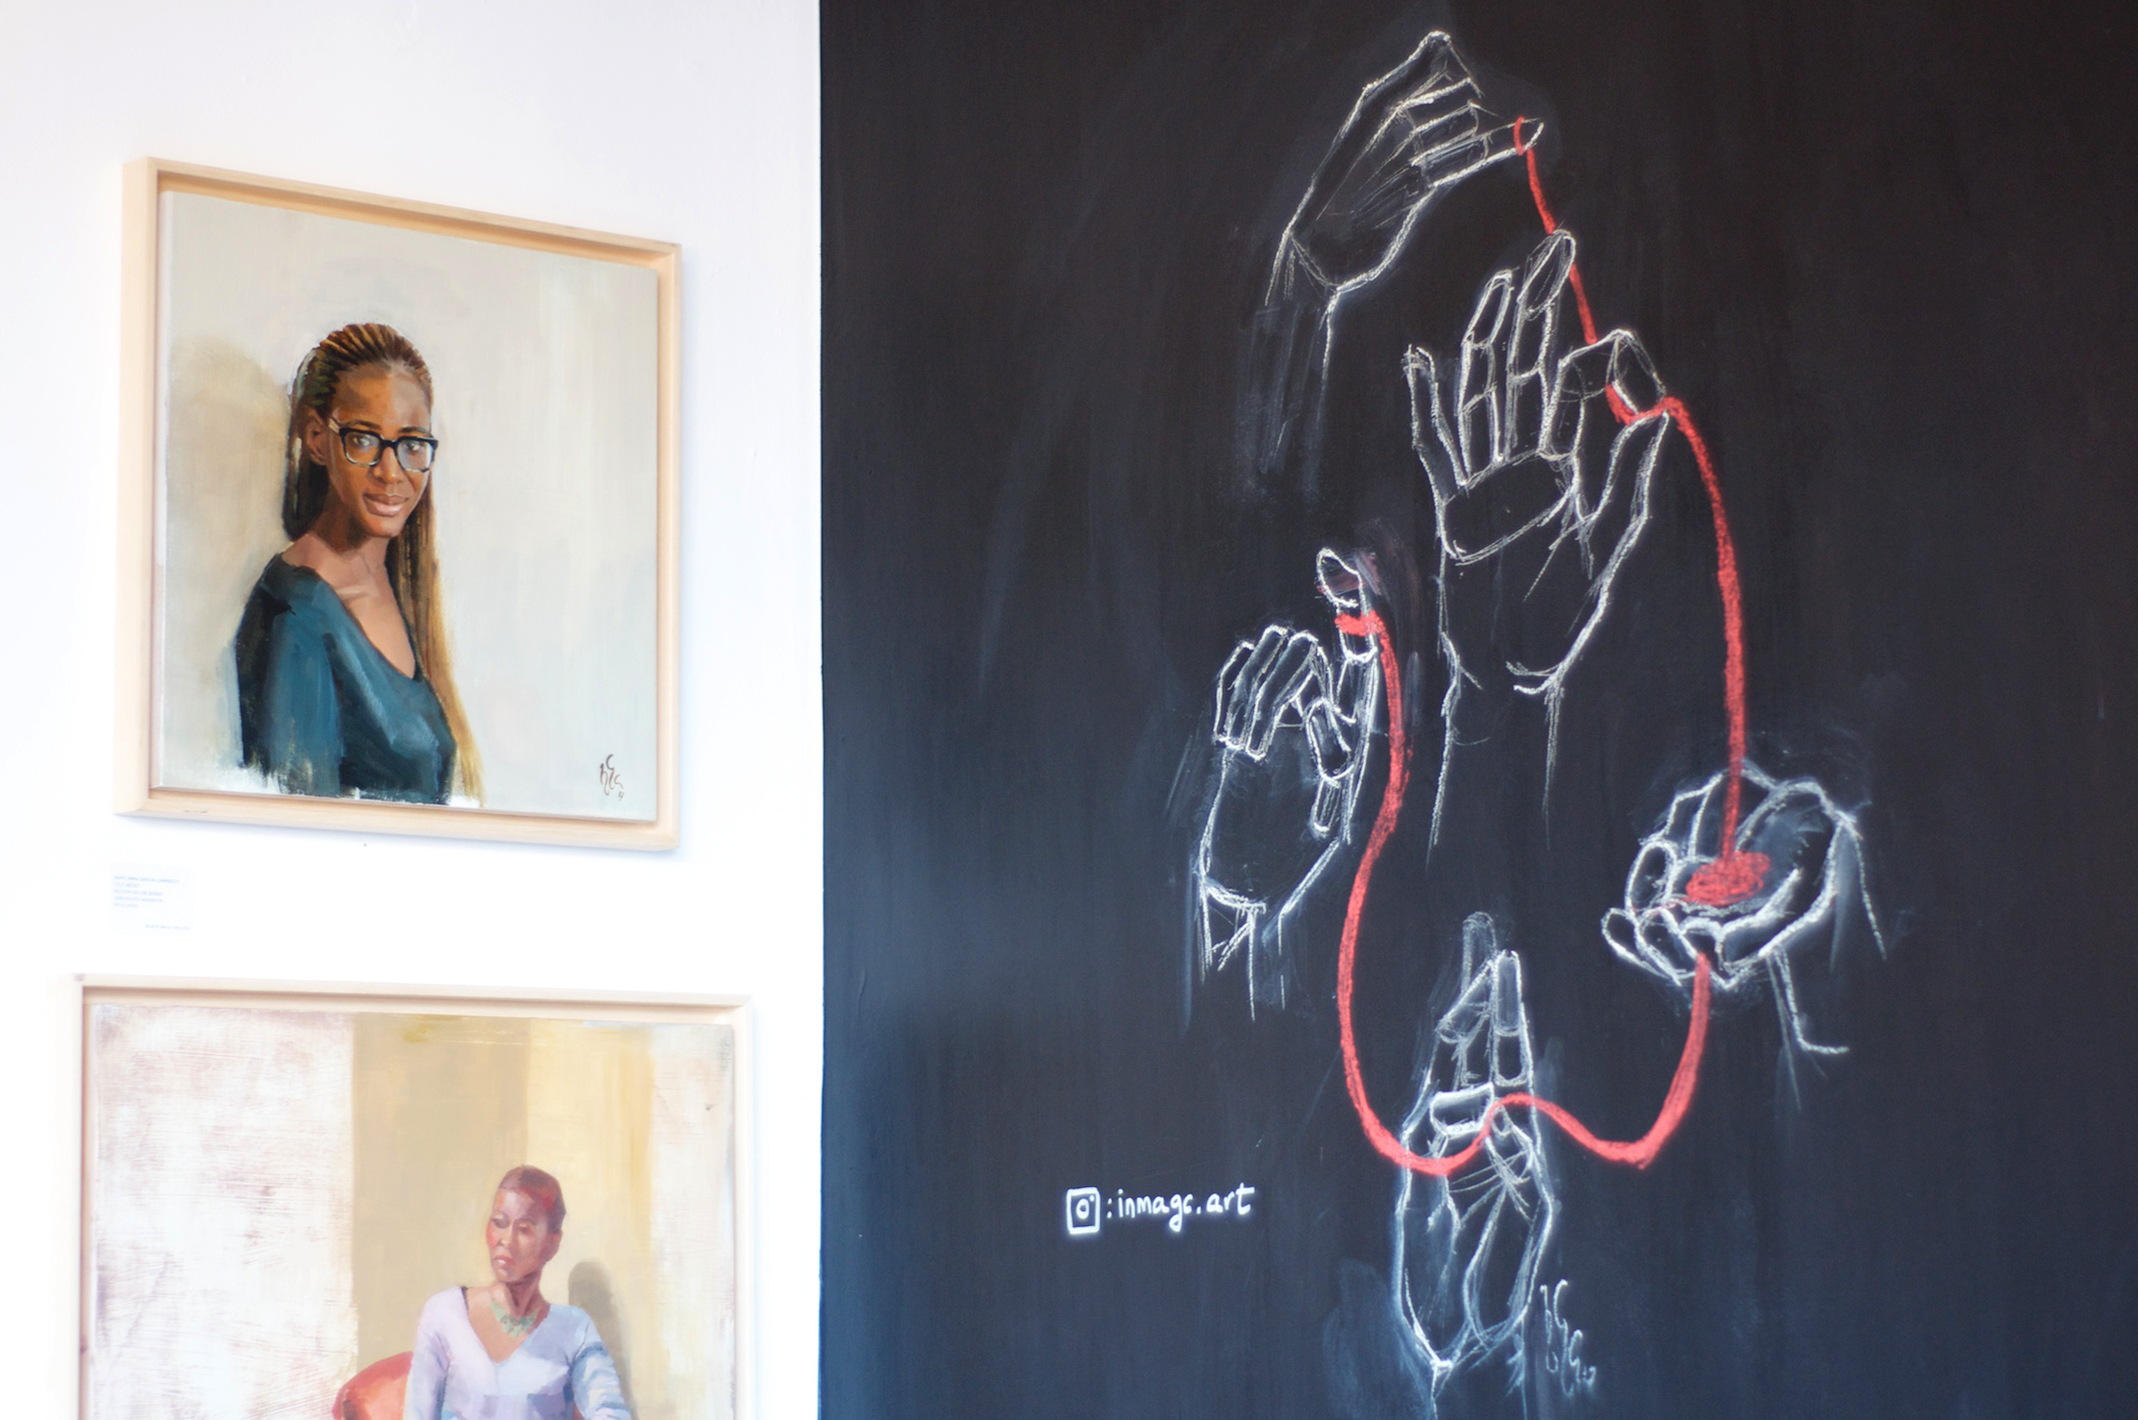 The café's Black Wall gallery